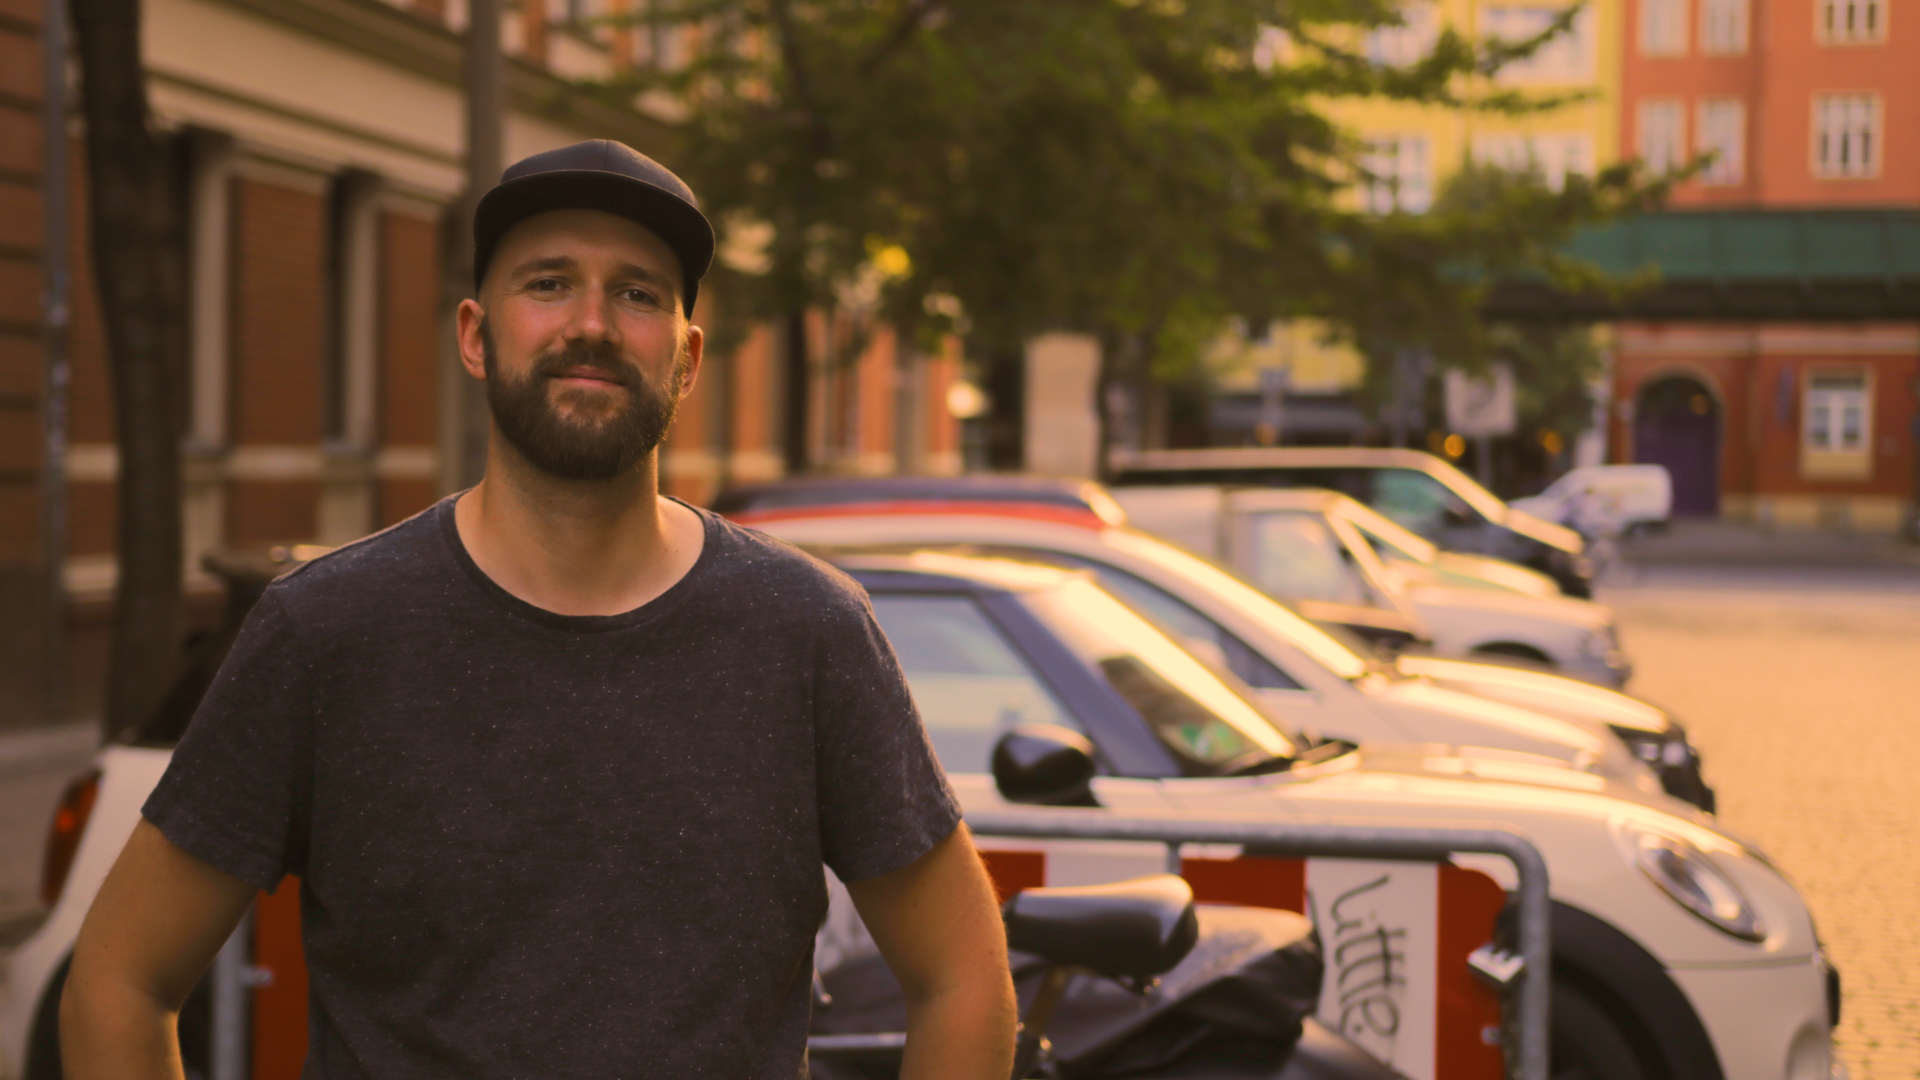 Episode 55: James the Berlin filmmaker